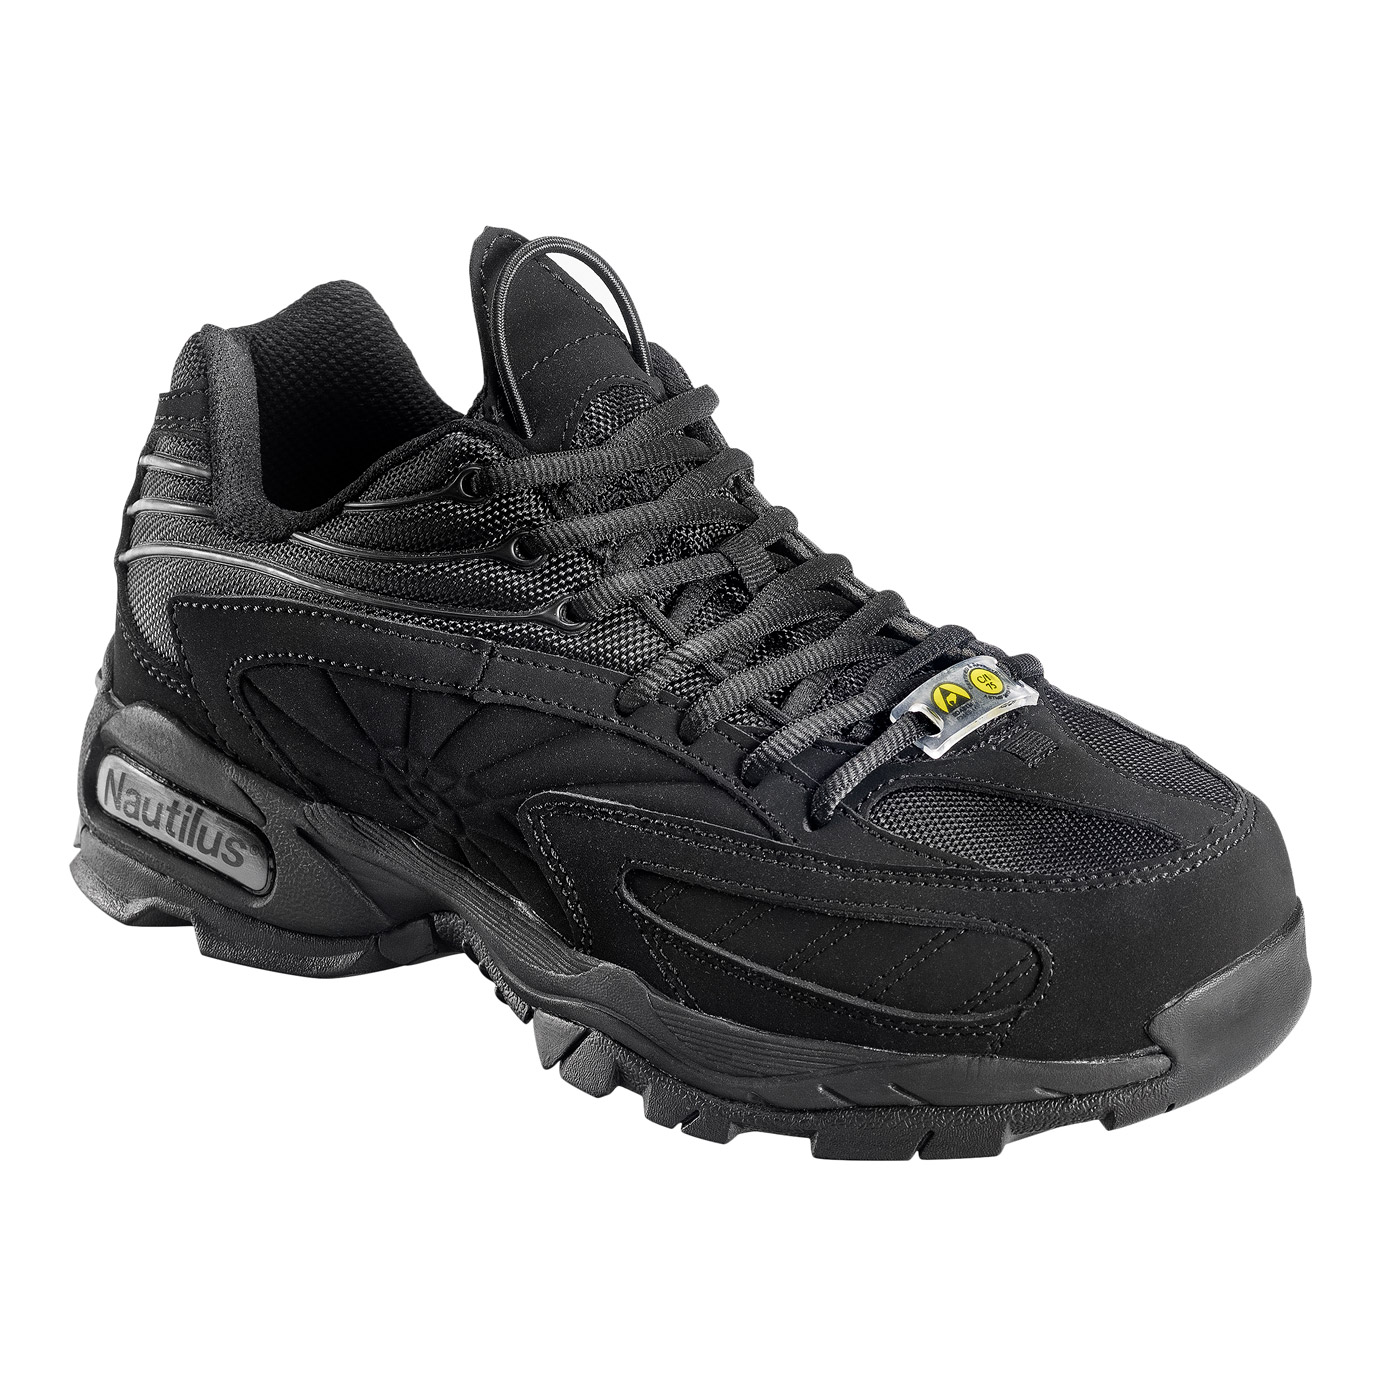 Black Steel Toe ESD Safety Work Shoe